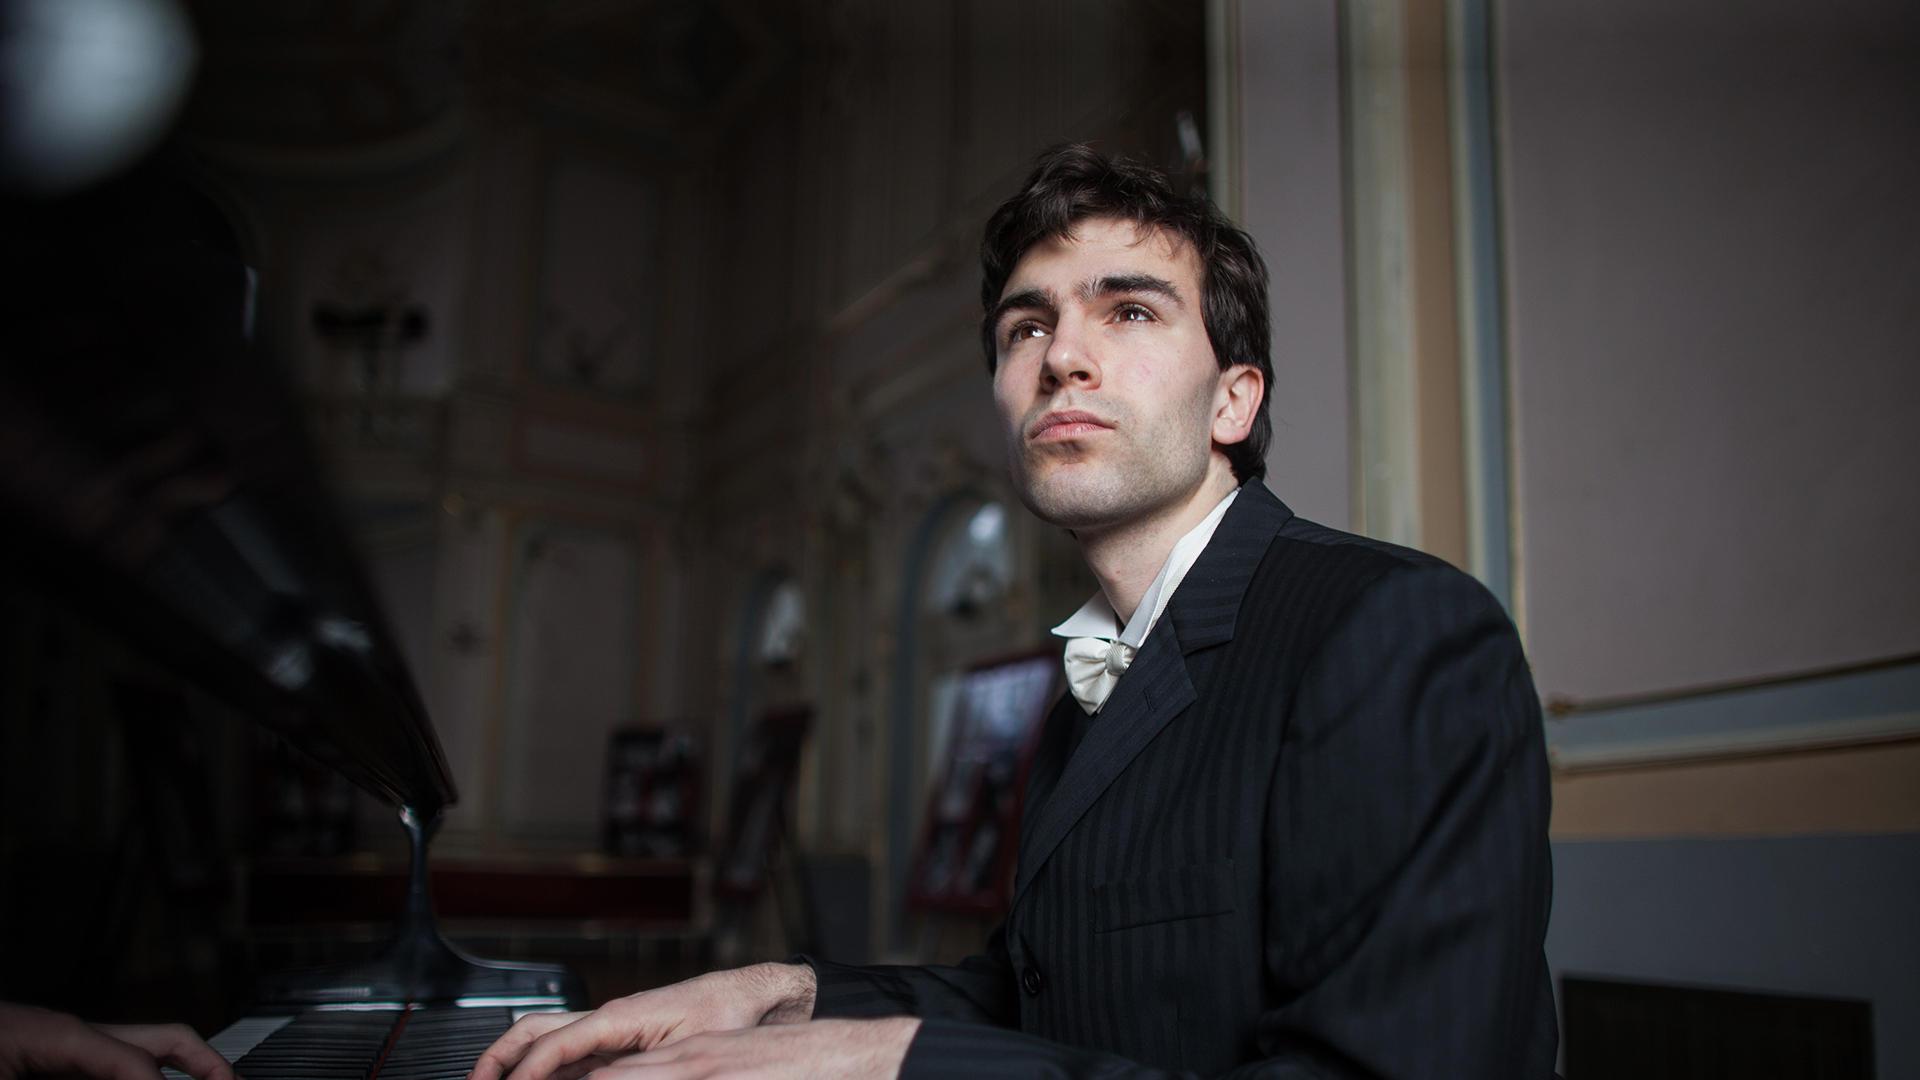 Svih pet Beethovenovih klavirskih koncerata u izvedbi splitskih pijanista i Orkestra splitske Opere